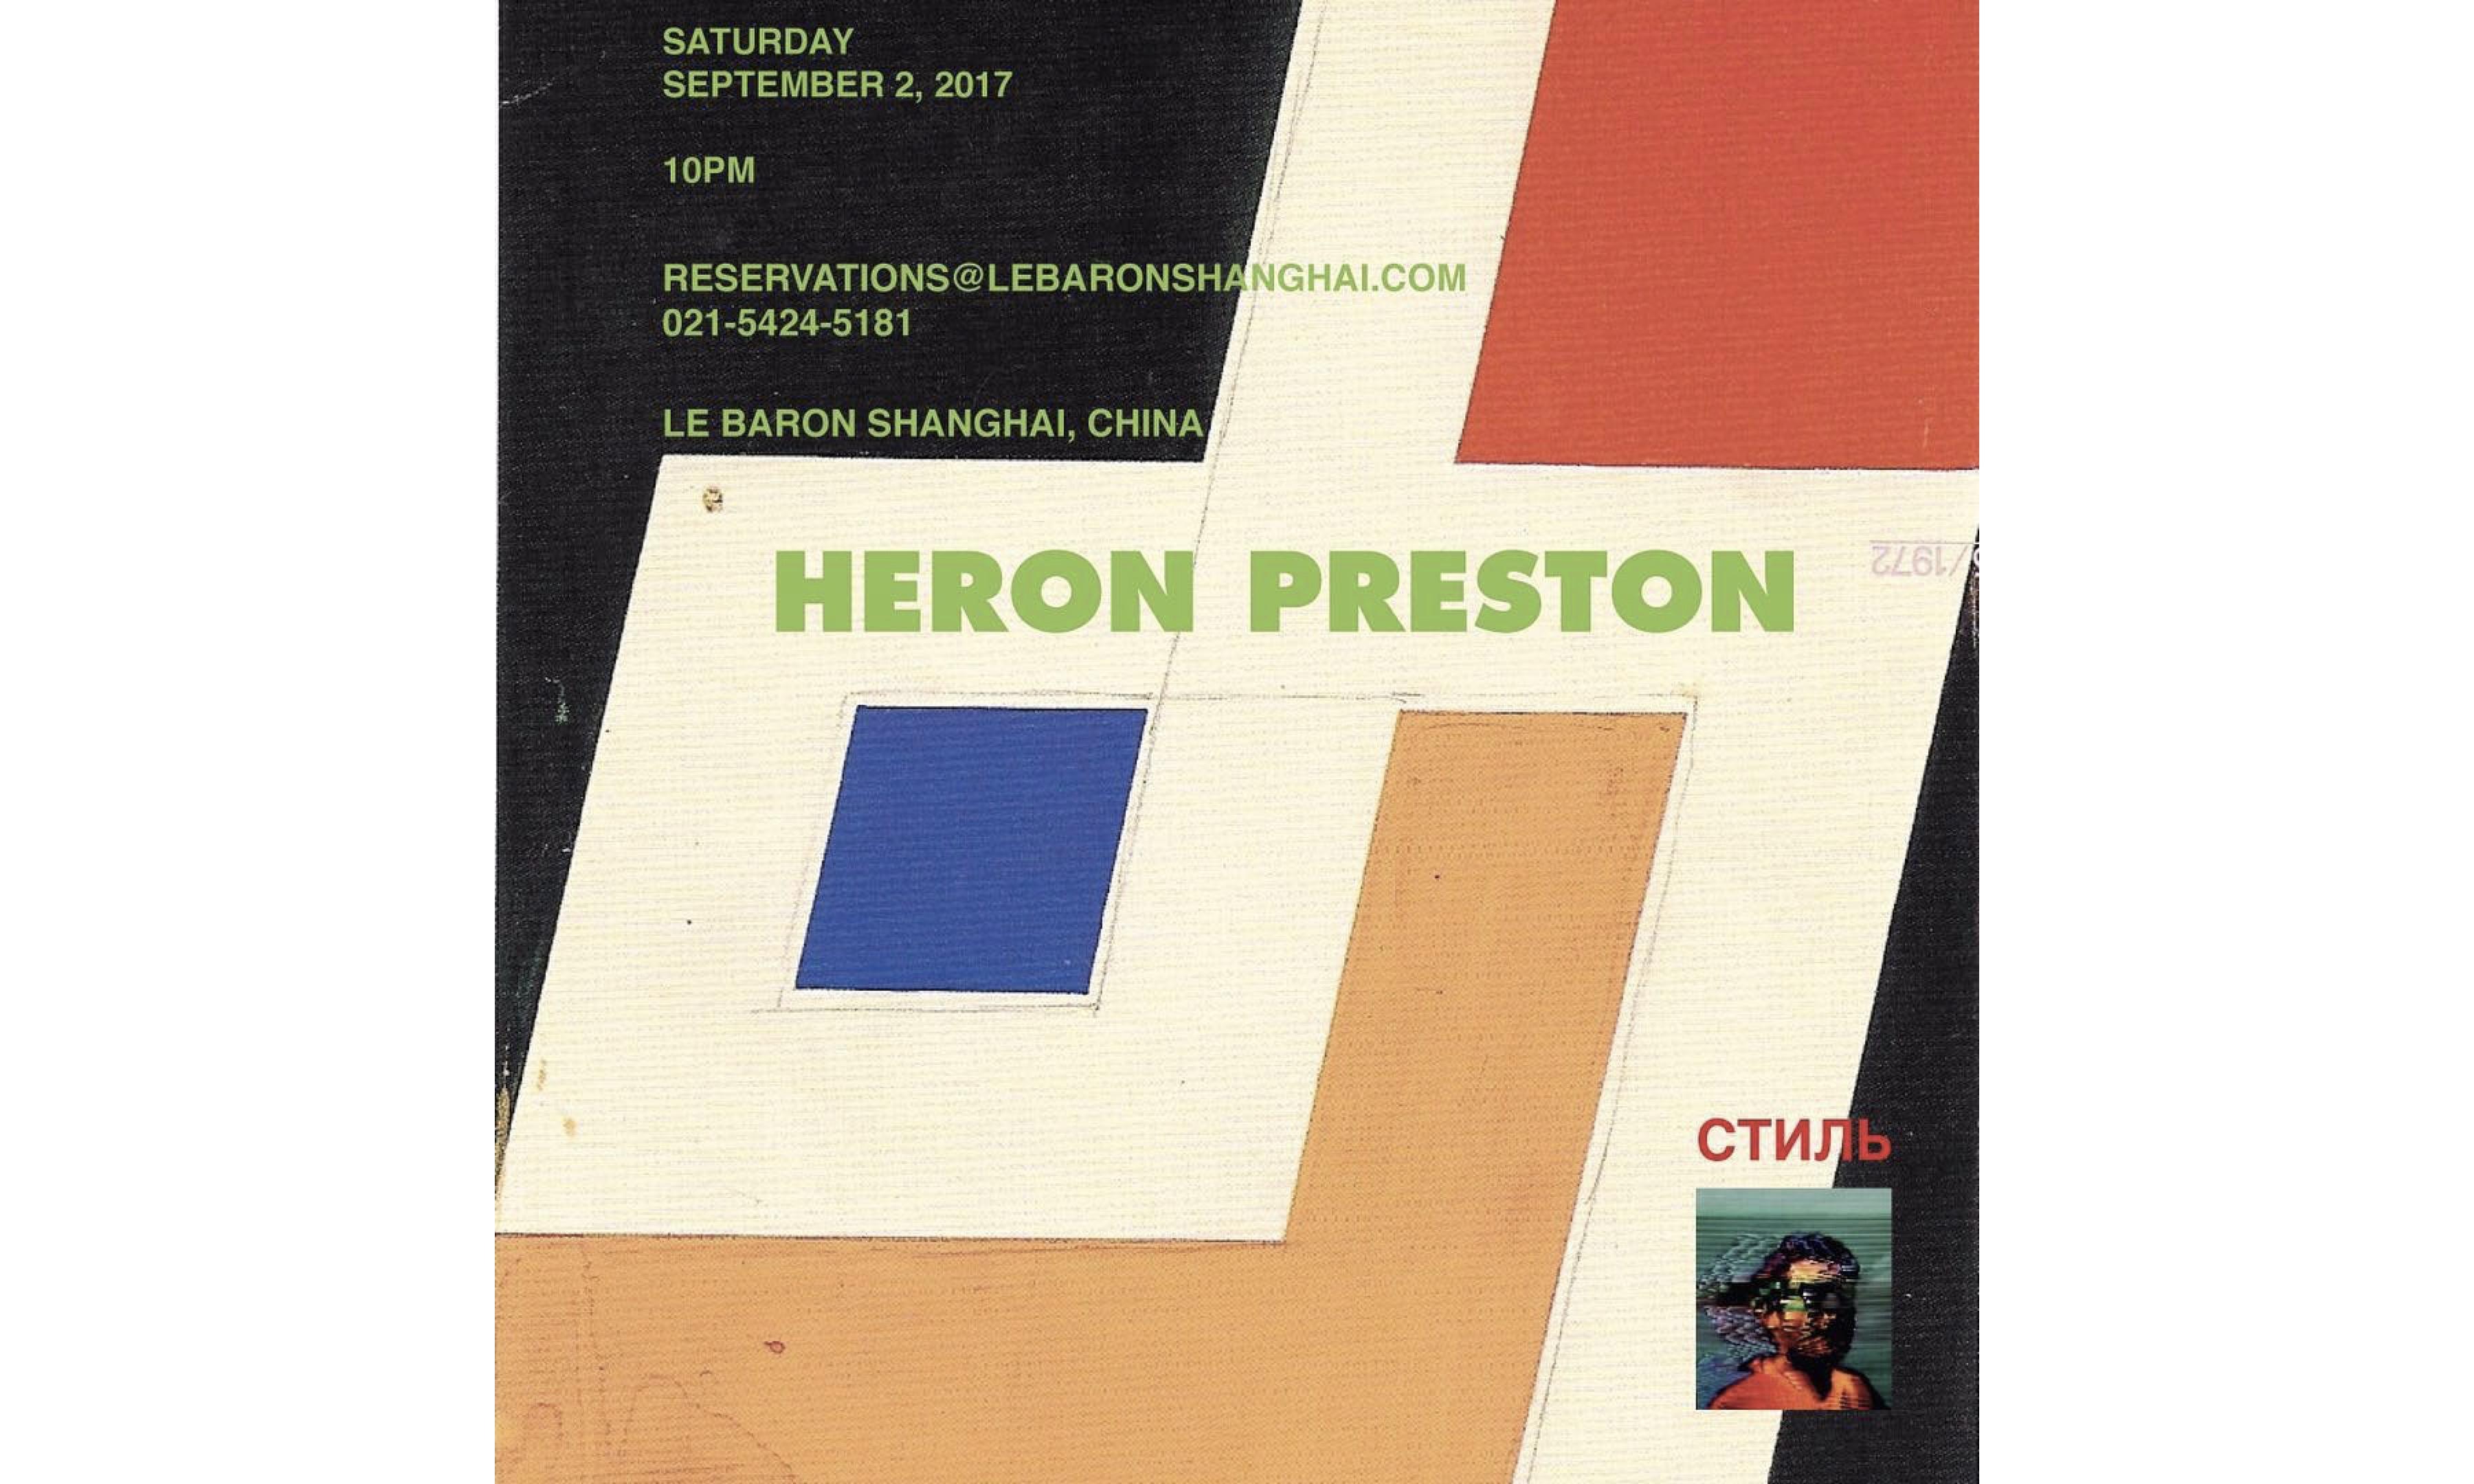 Heron Preston 9 月 2 日 空降上海 LE BARON